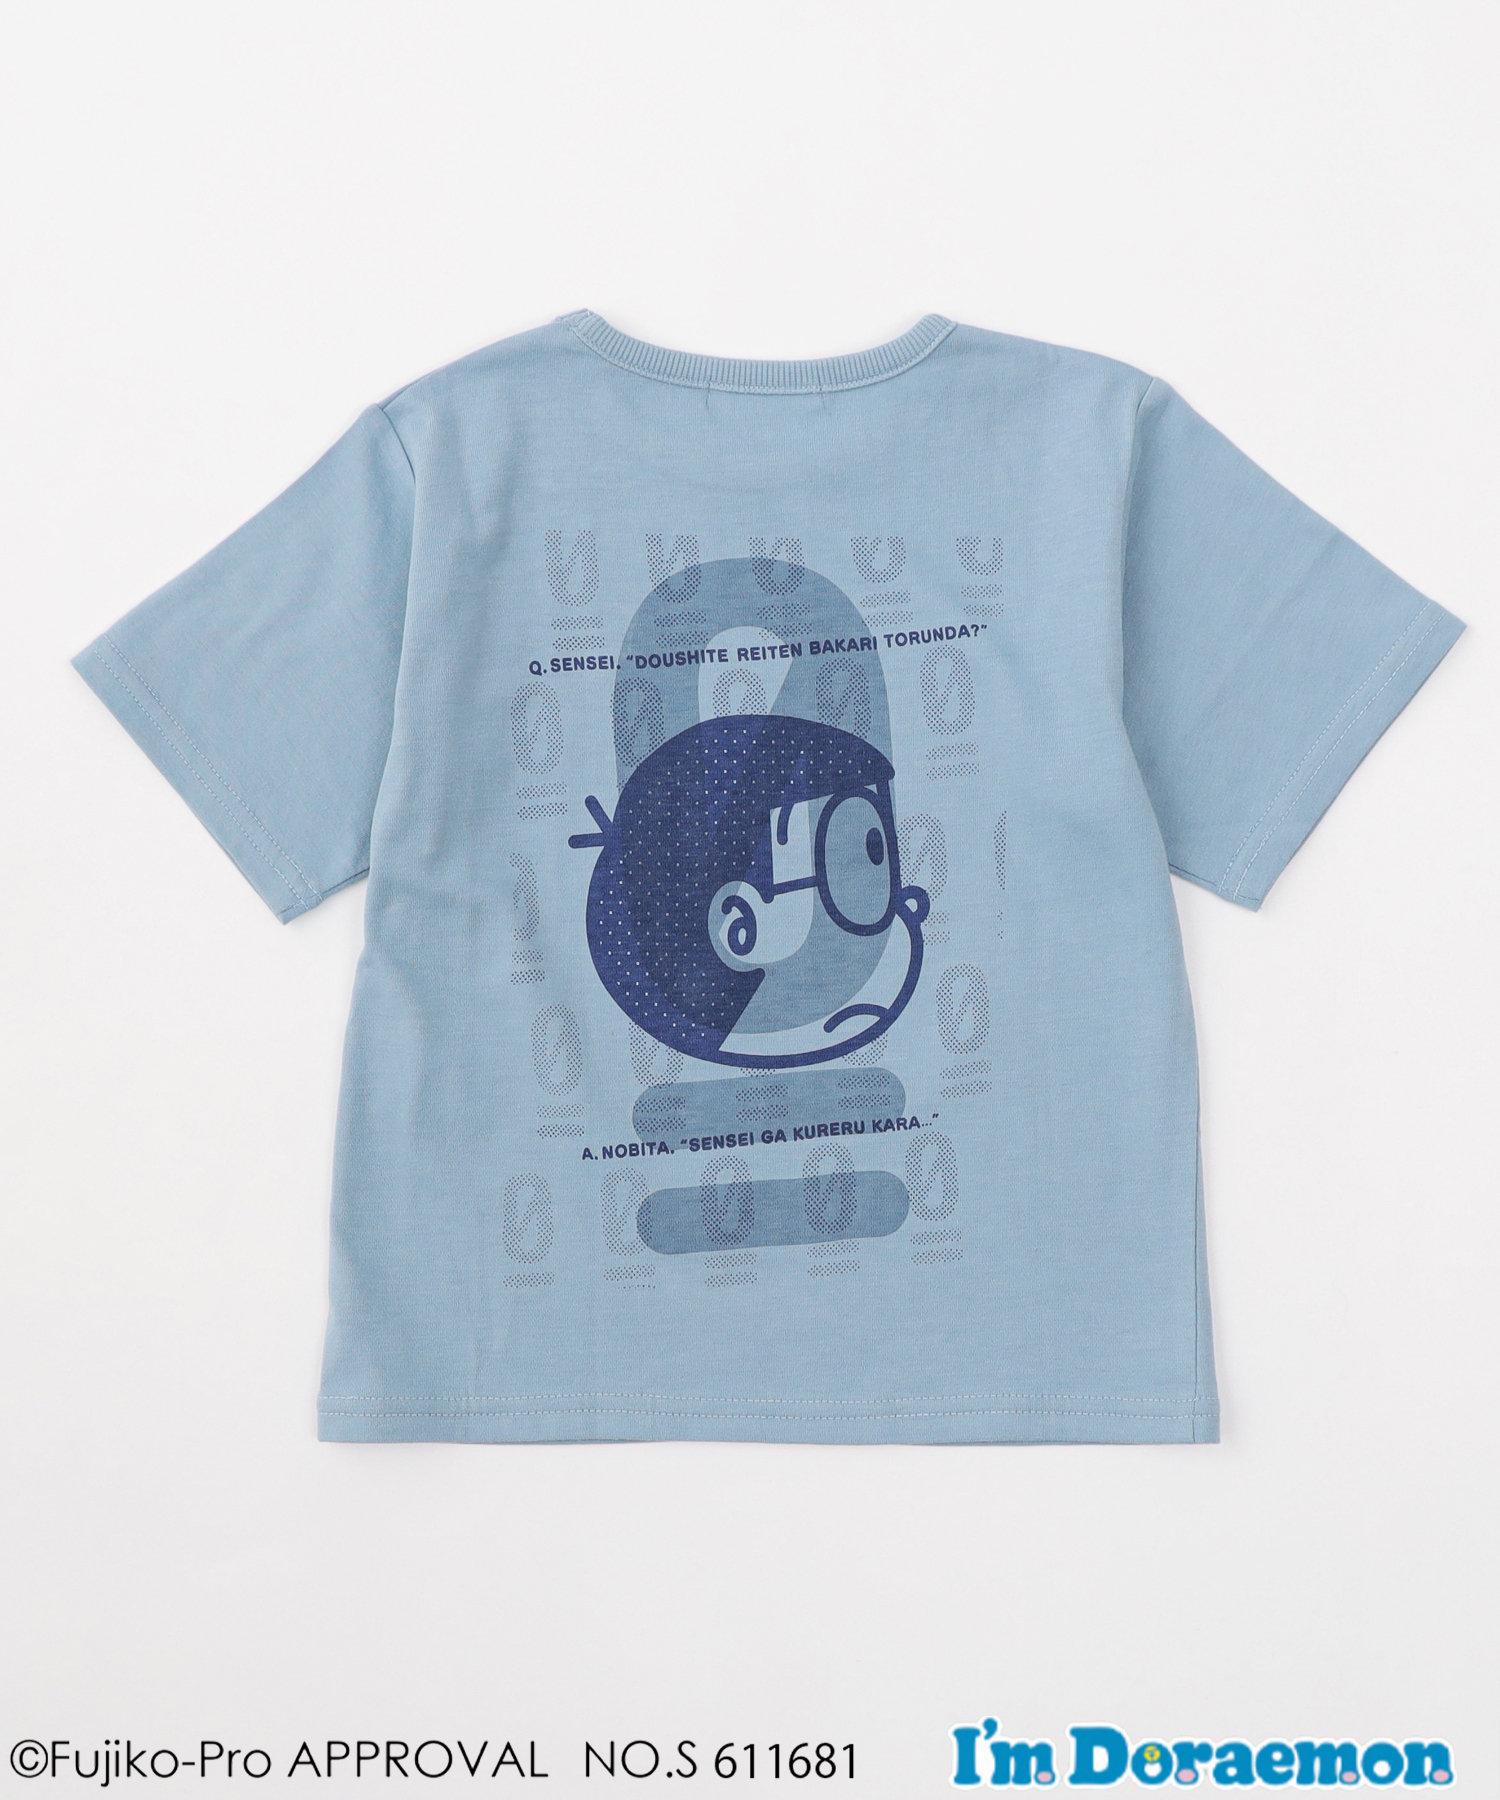 CIAOPANIC TYPY(チャオパニックティピー) キッズ 【KIDS】【I'mDoraemondeTYPY】のび太0点バックプリントTee ブルー